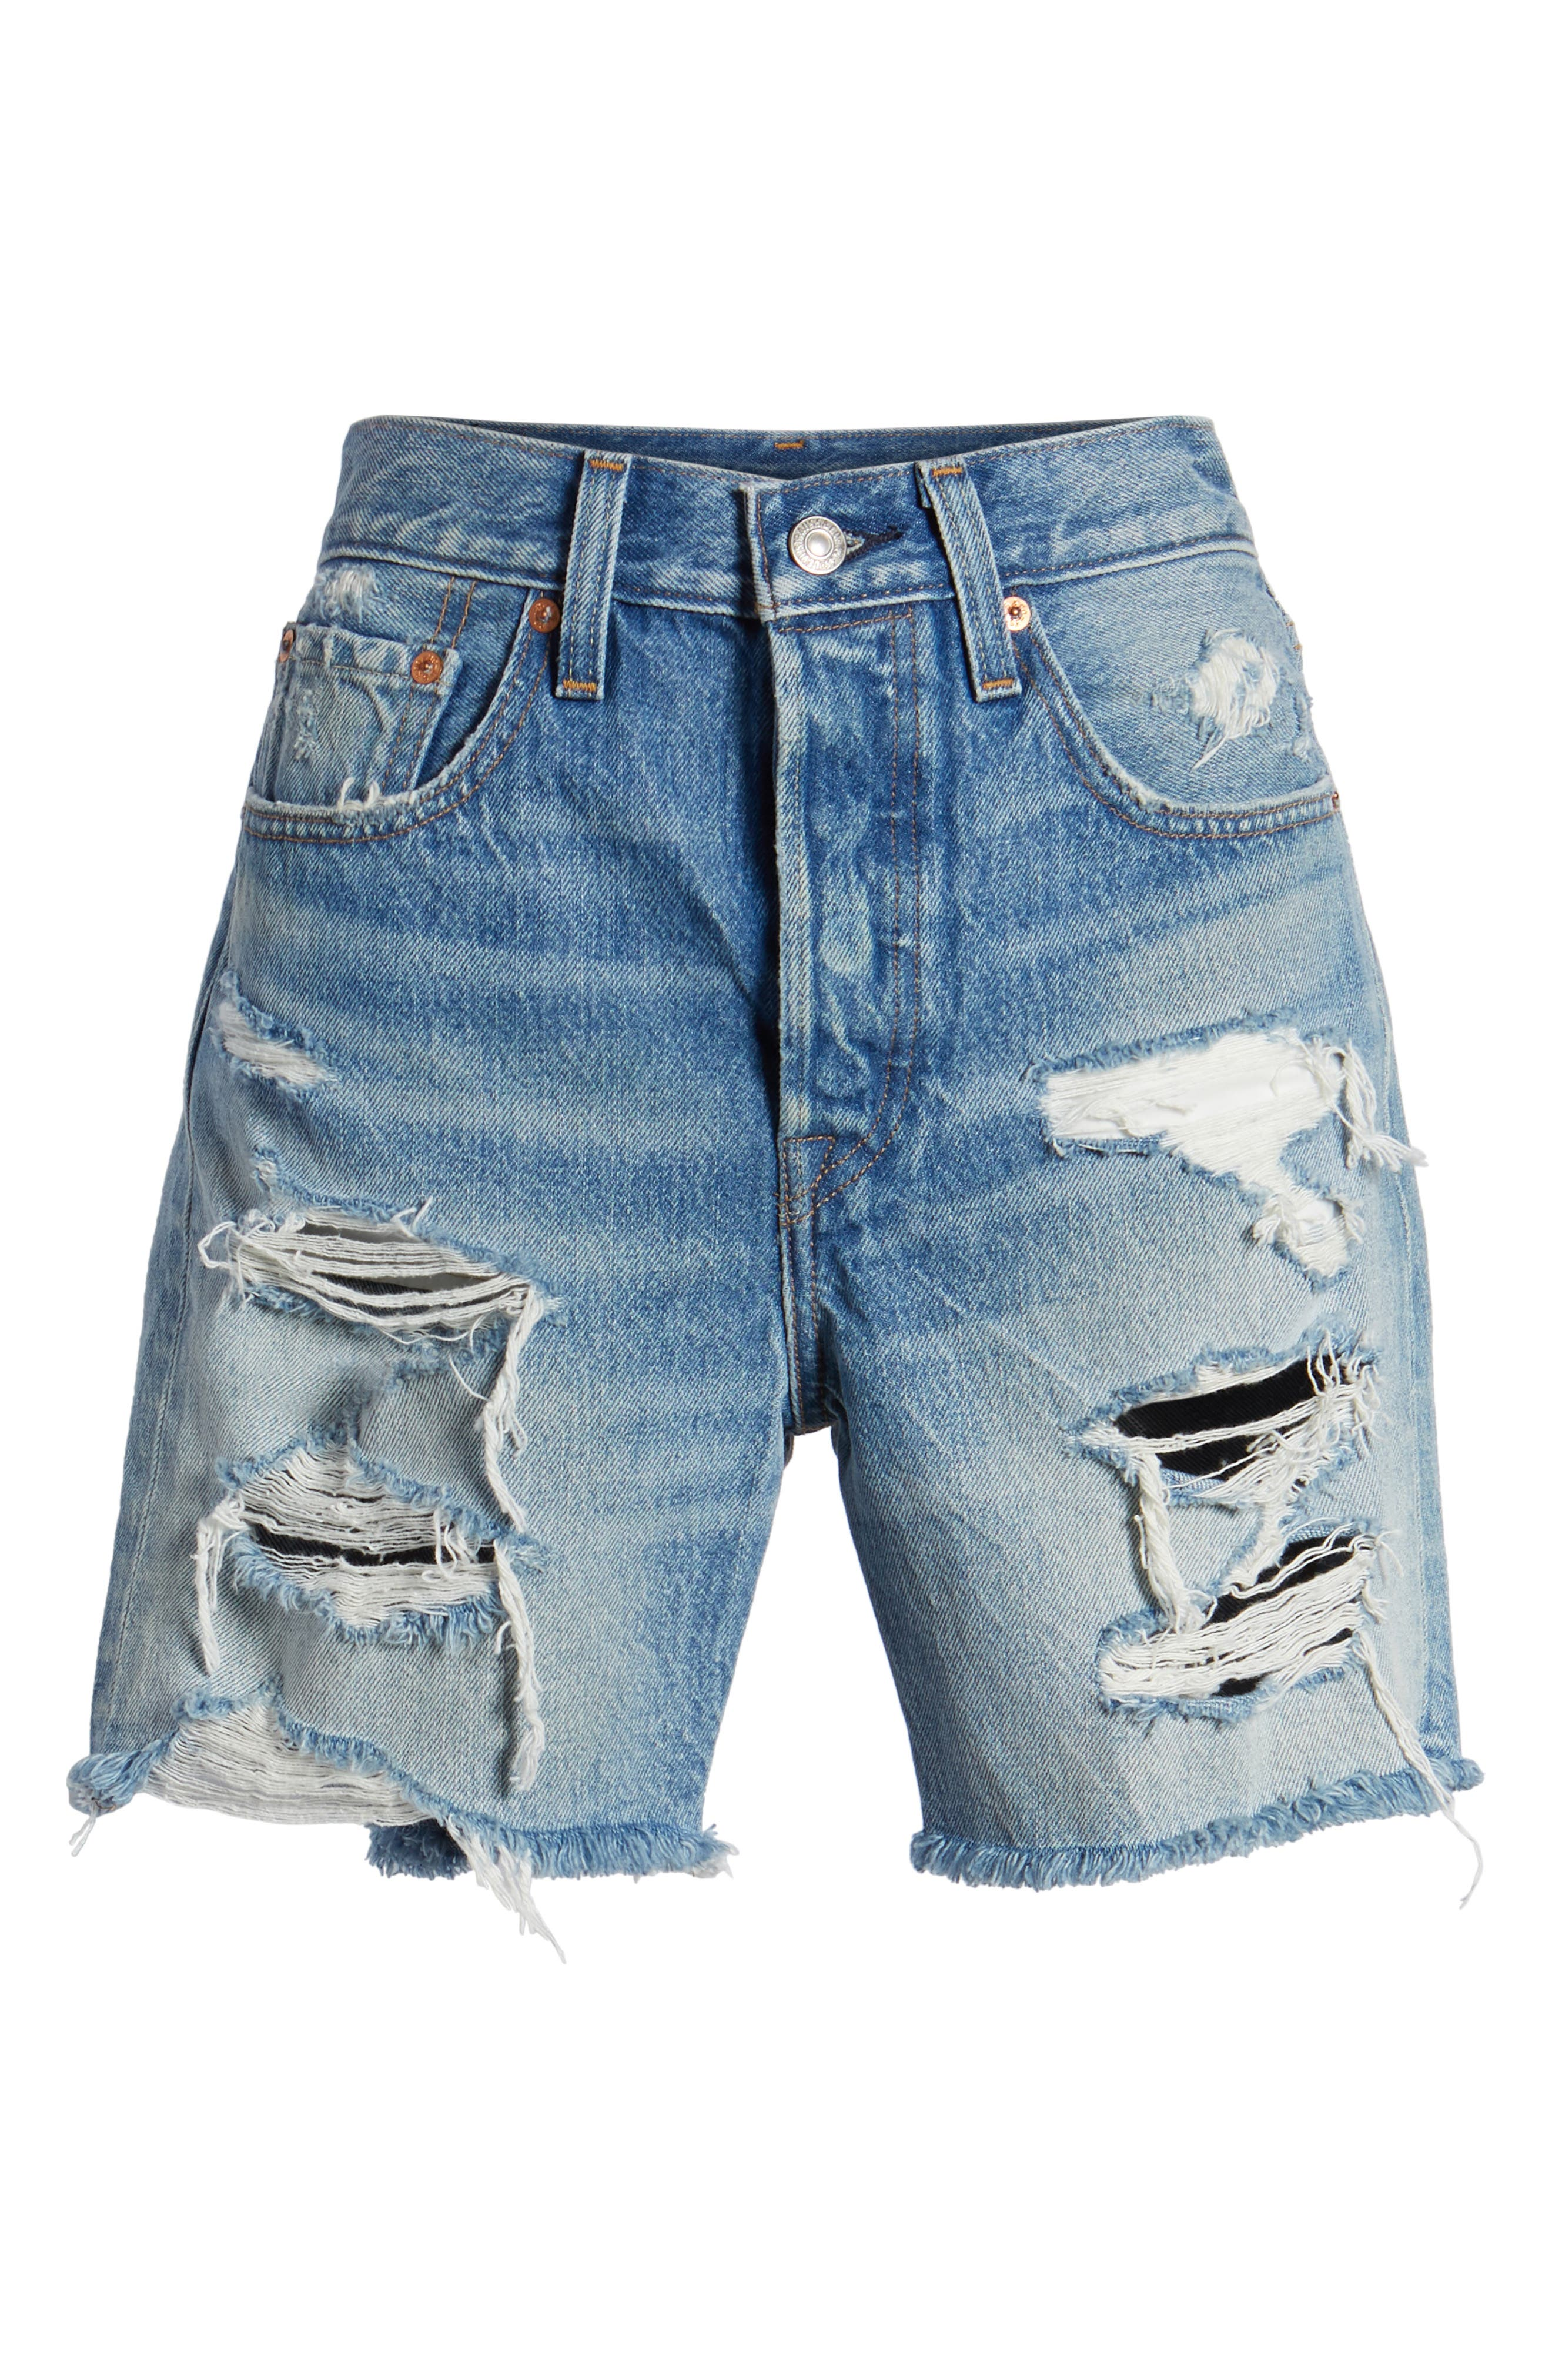 Indie Shredded Cutoff Denim Shorts,                             Alternate thumbnail 7, color,                             450